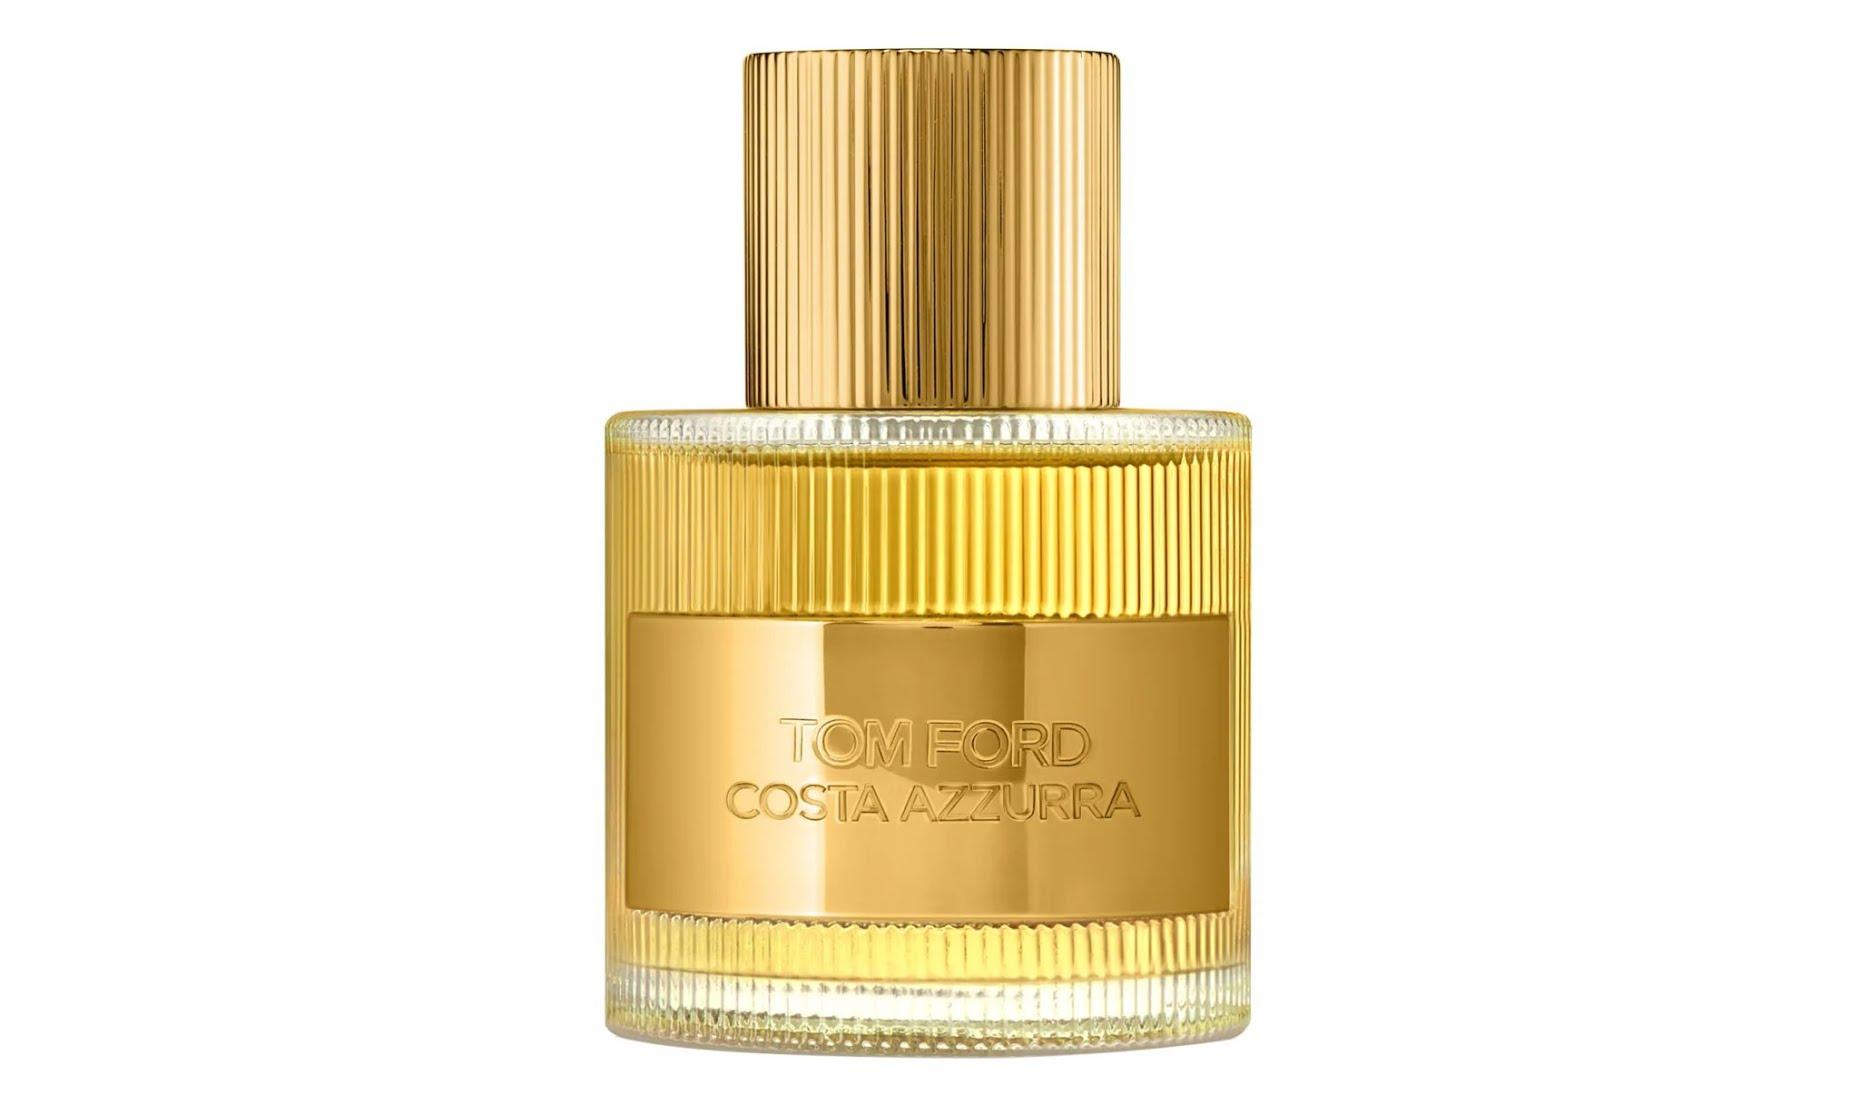 Meilleurs parfums homme 2021 - Costa Azzurra Tom Ford